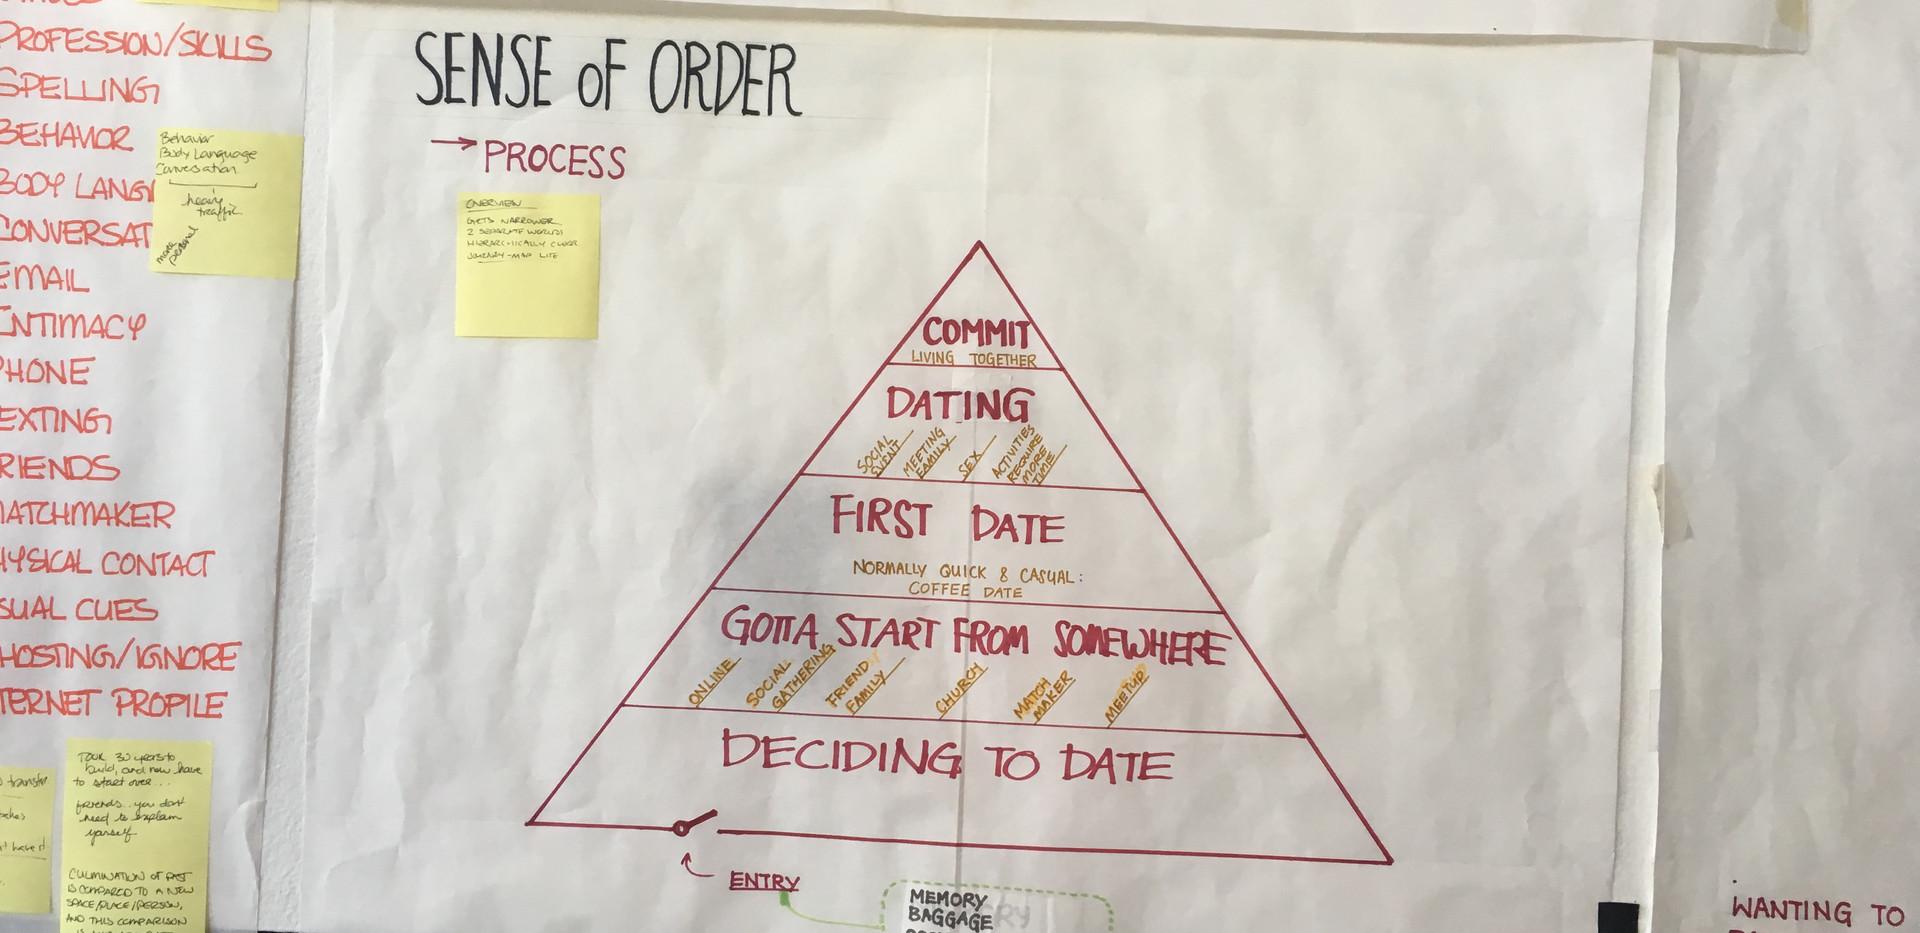 Sense of Order